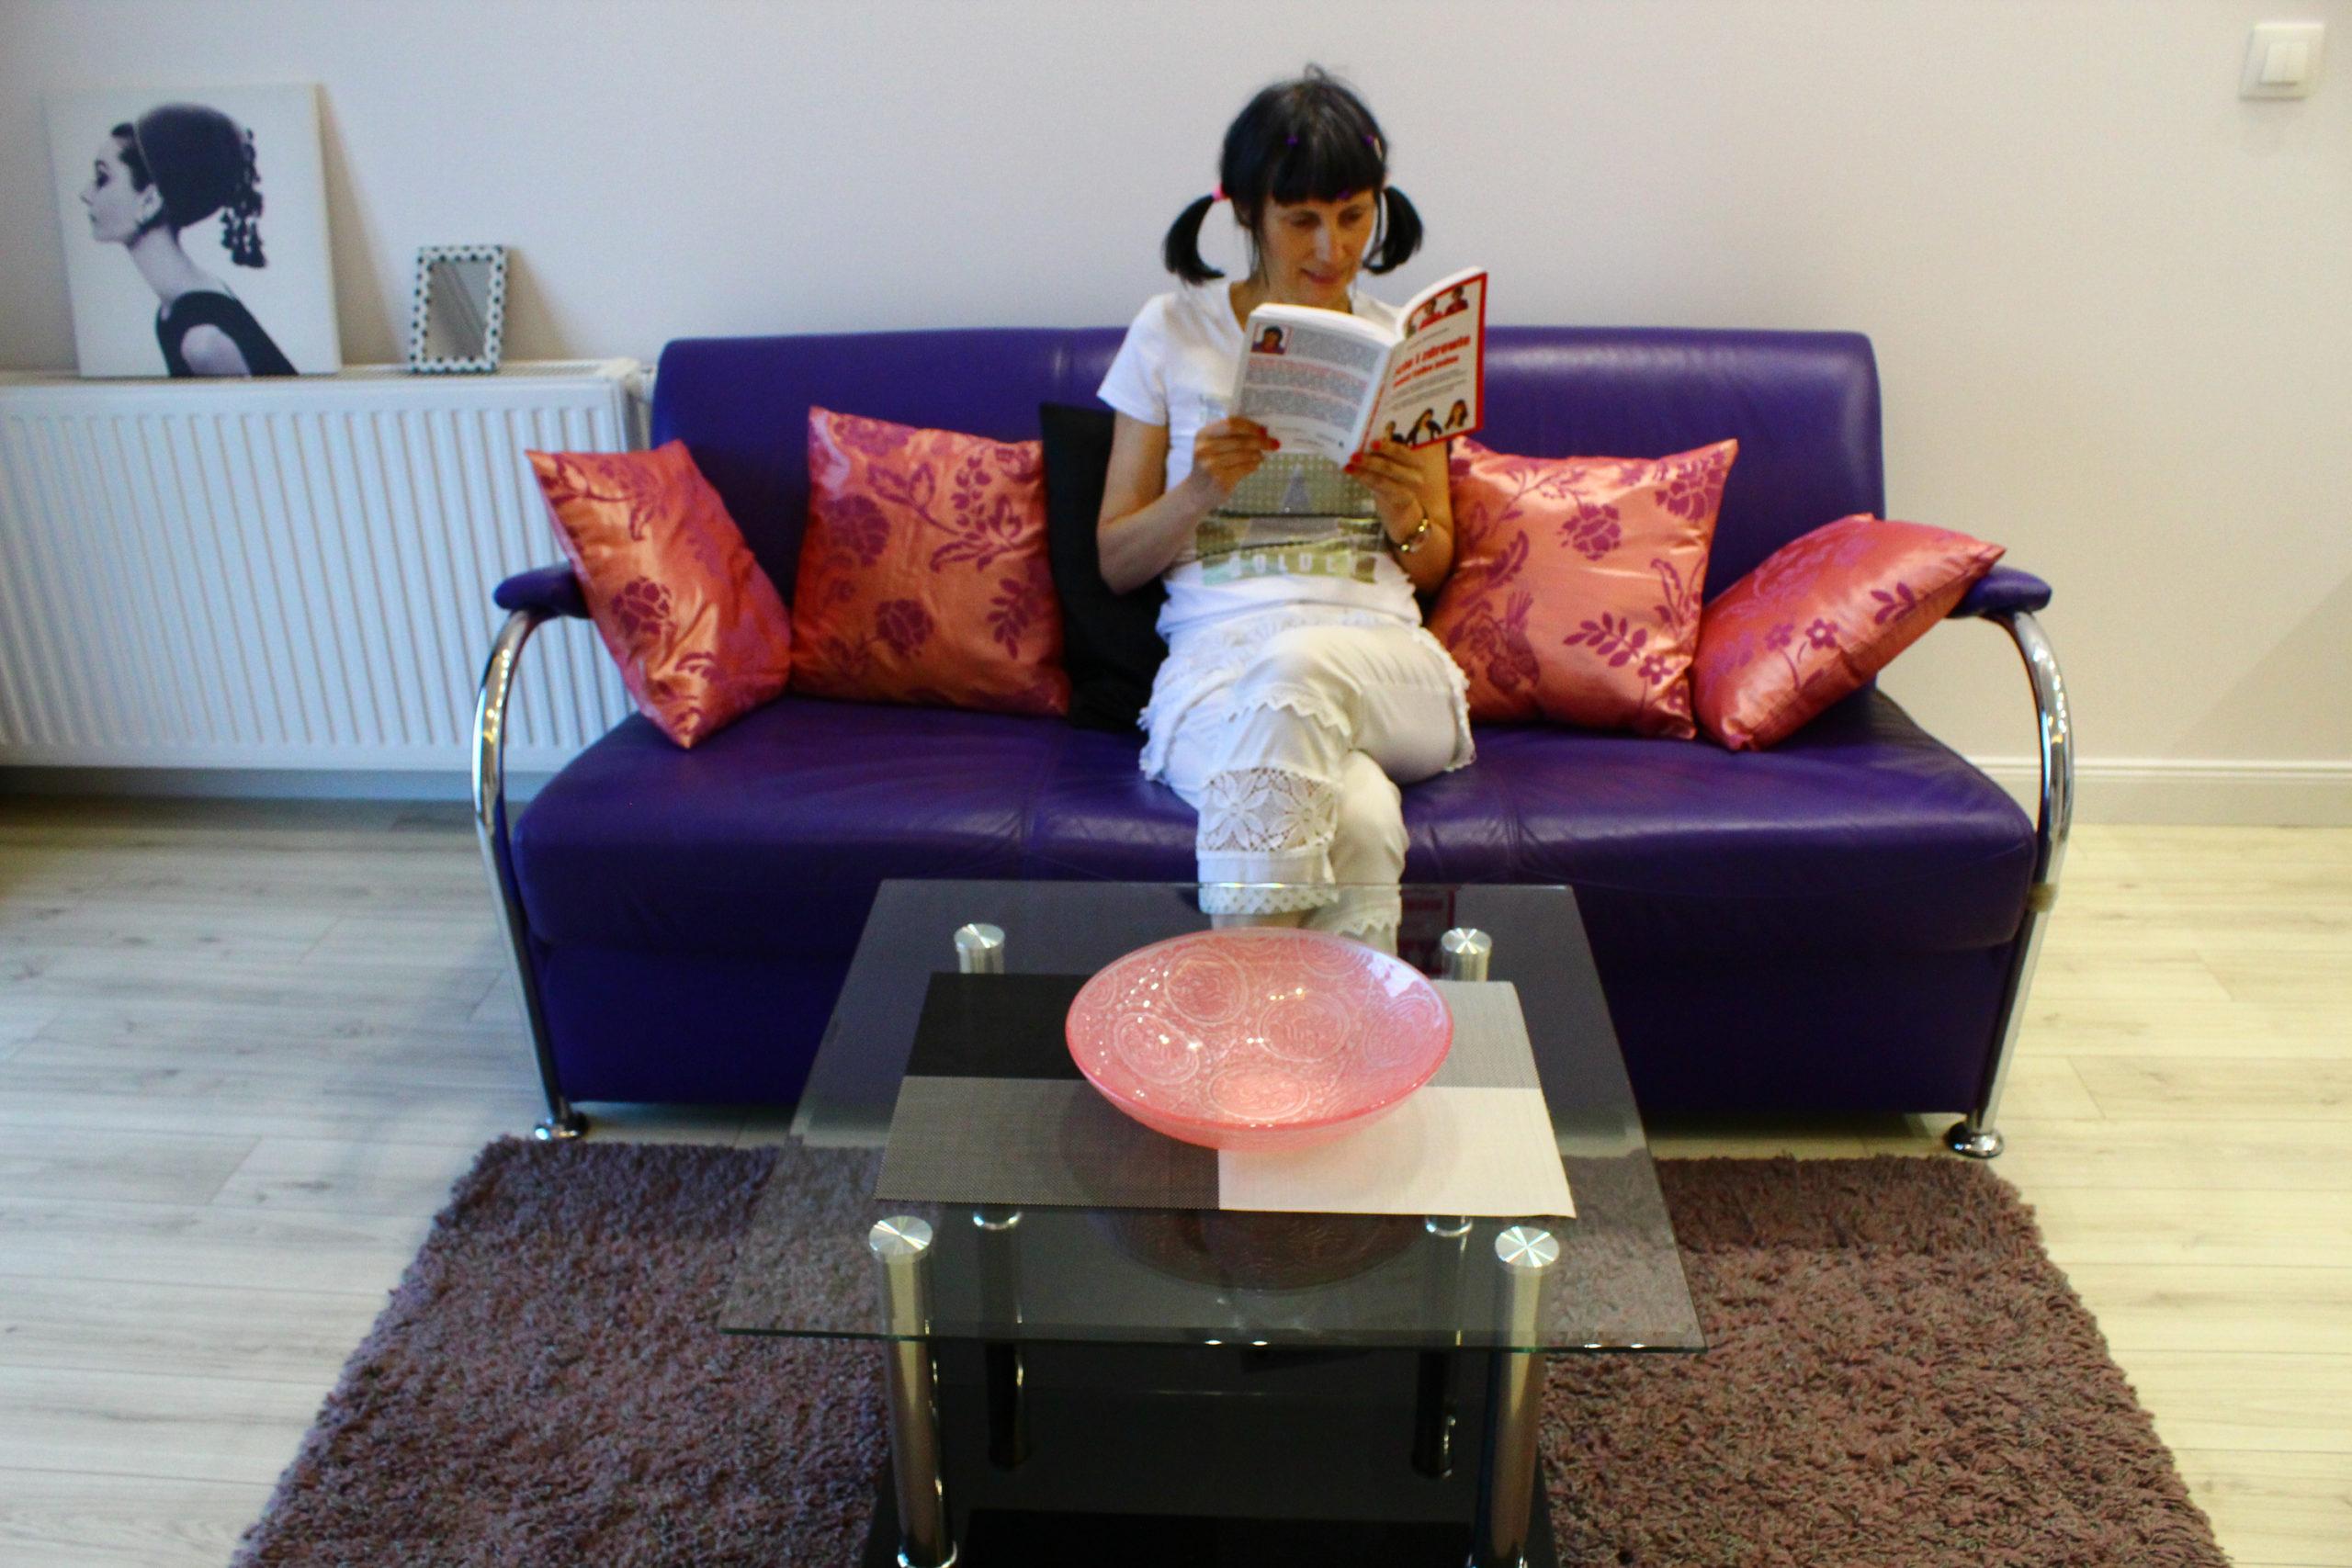 Viola czyta książkę na fioletowej kanapie